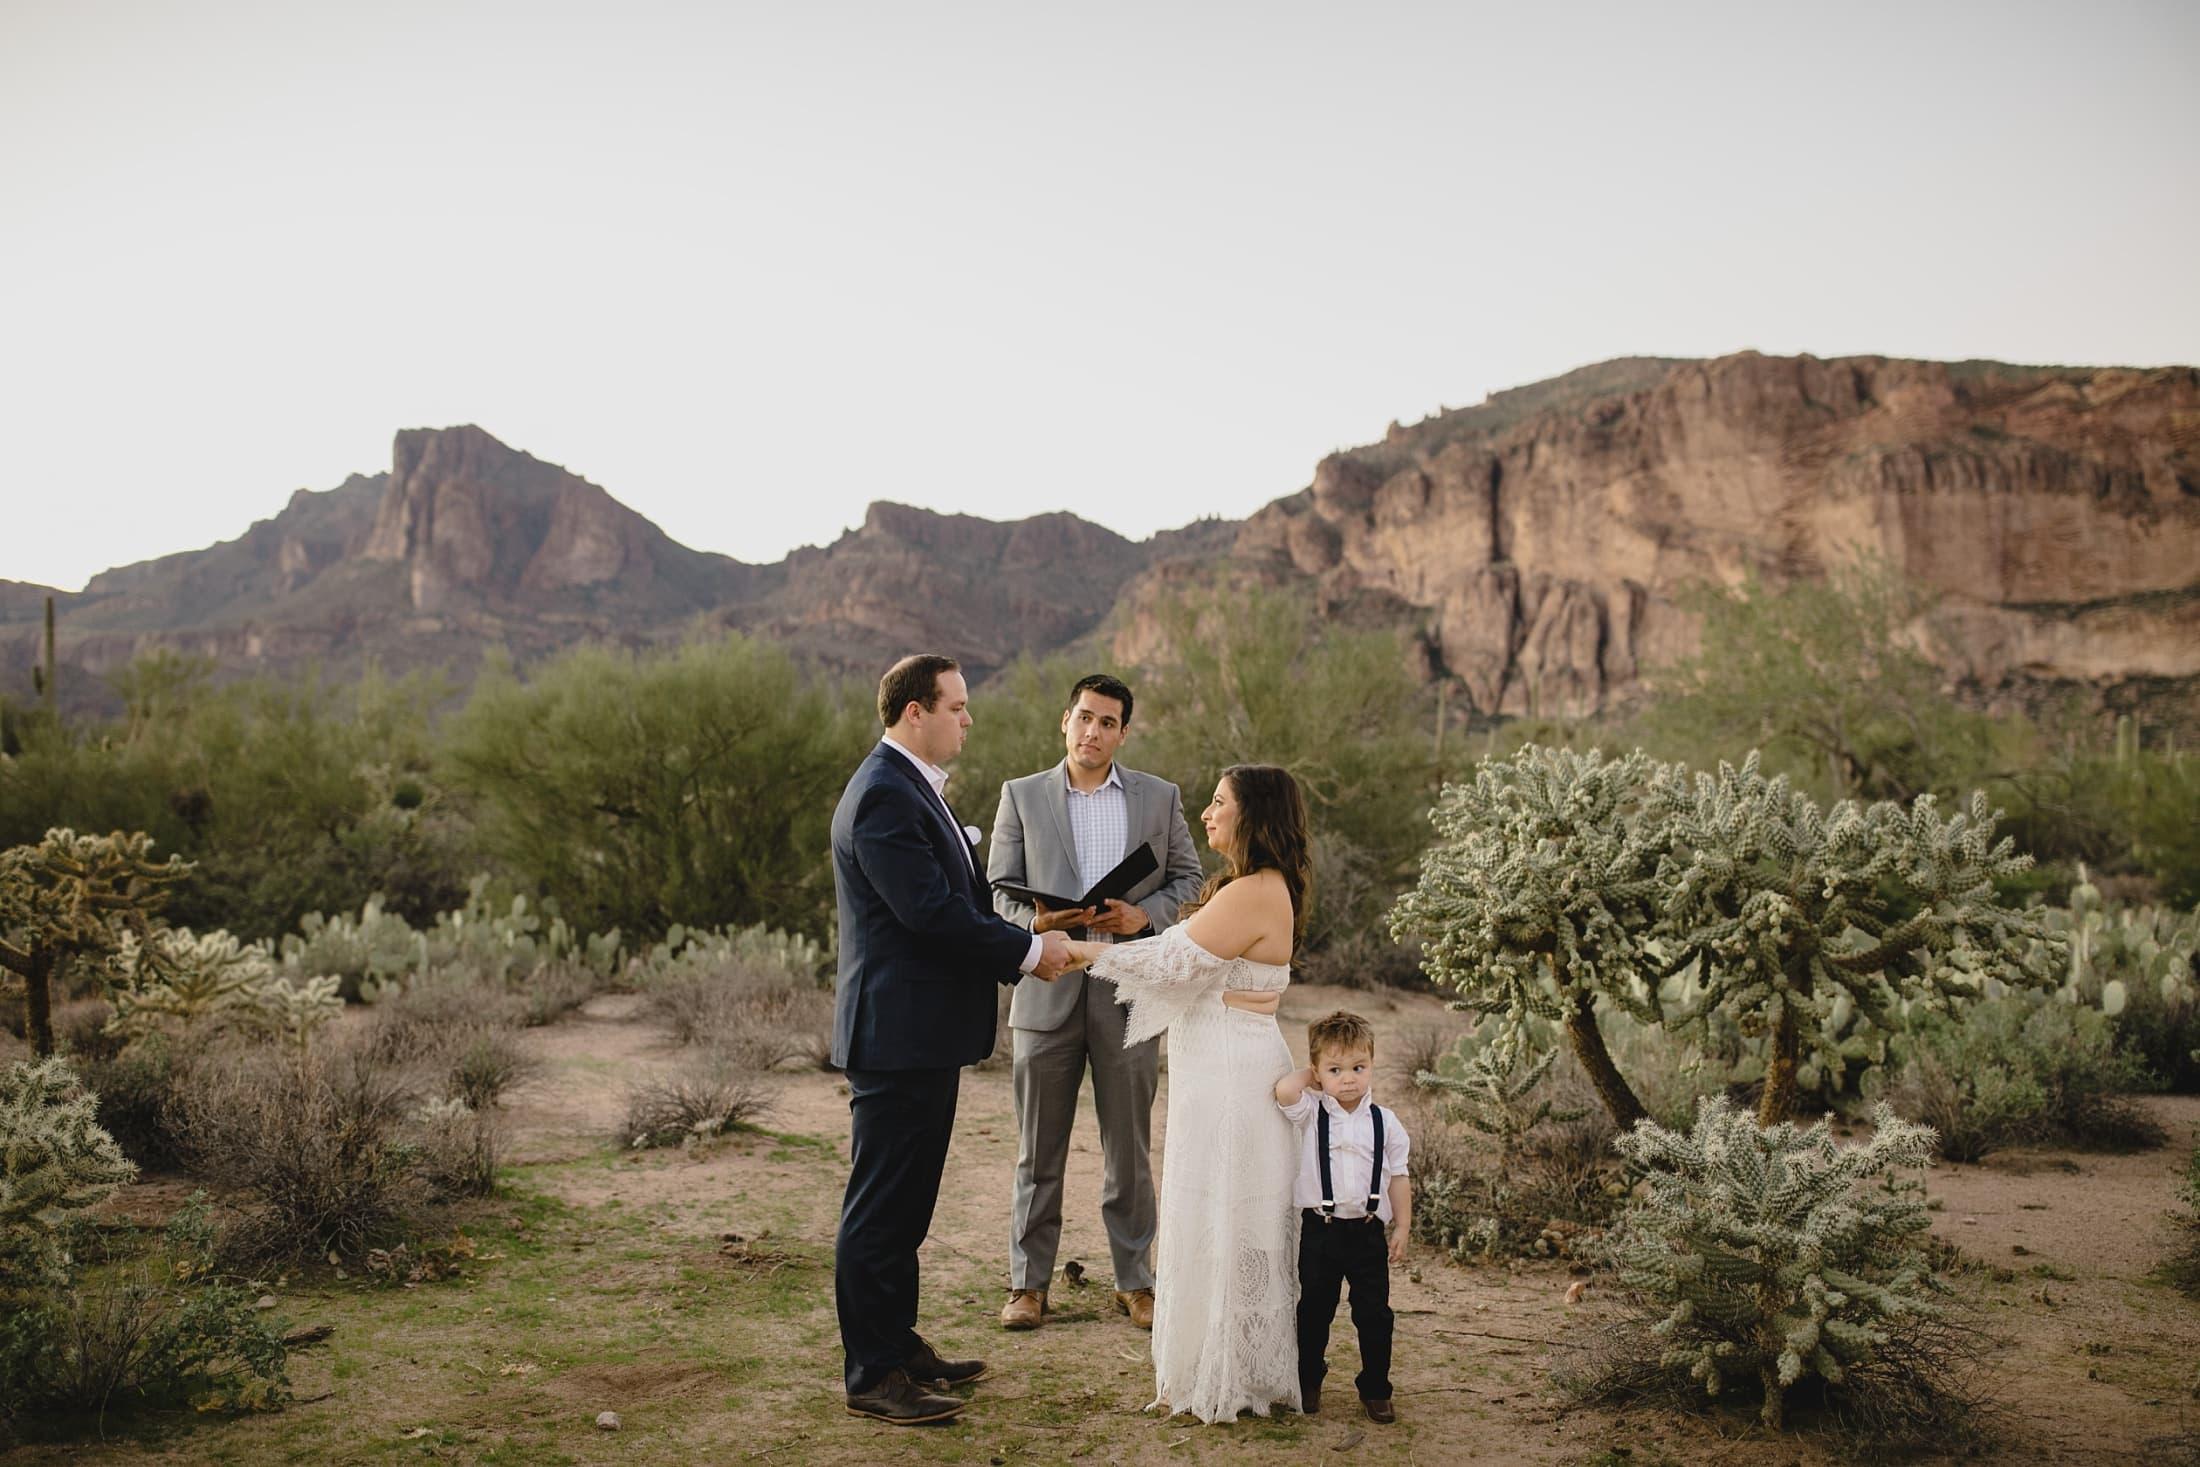 small wedding in Arizona desert bride and groom with kid